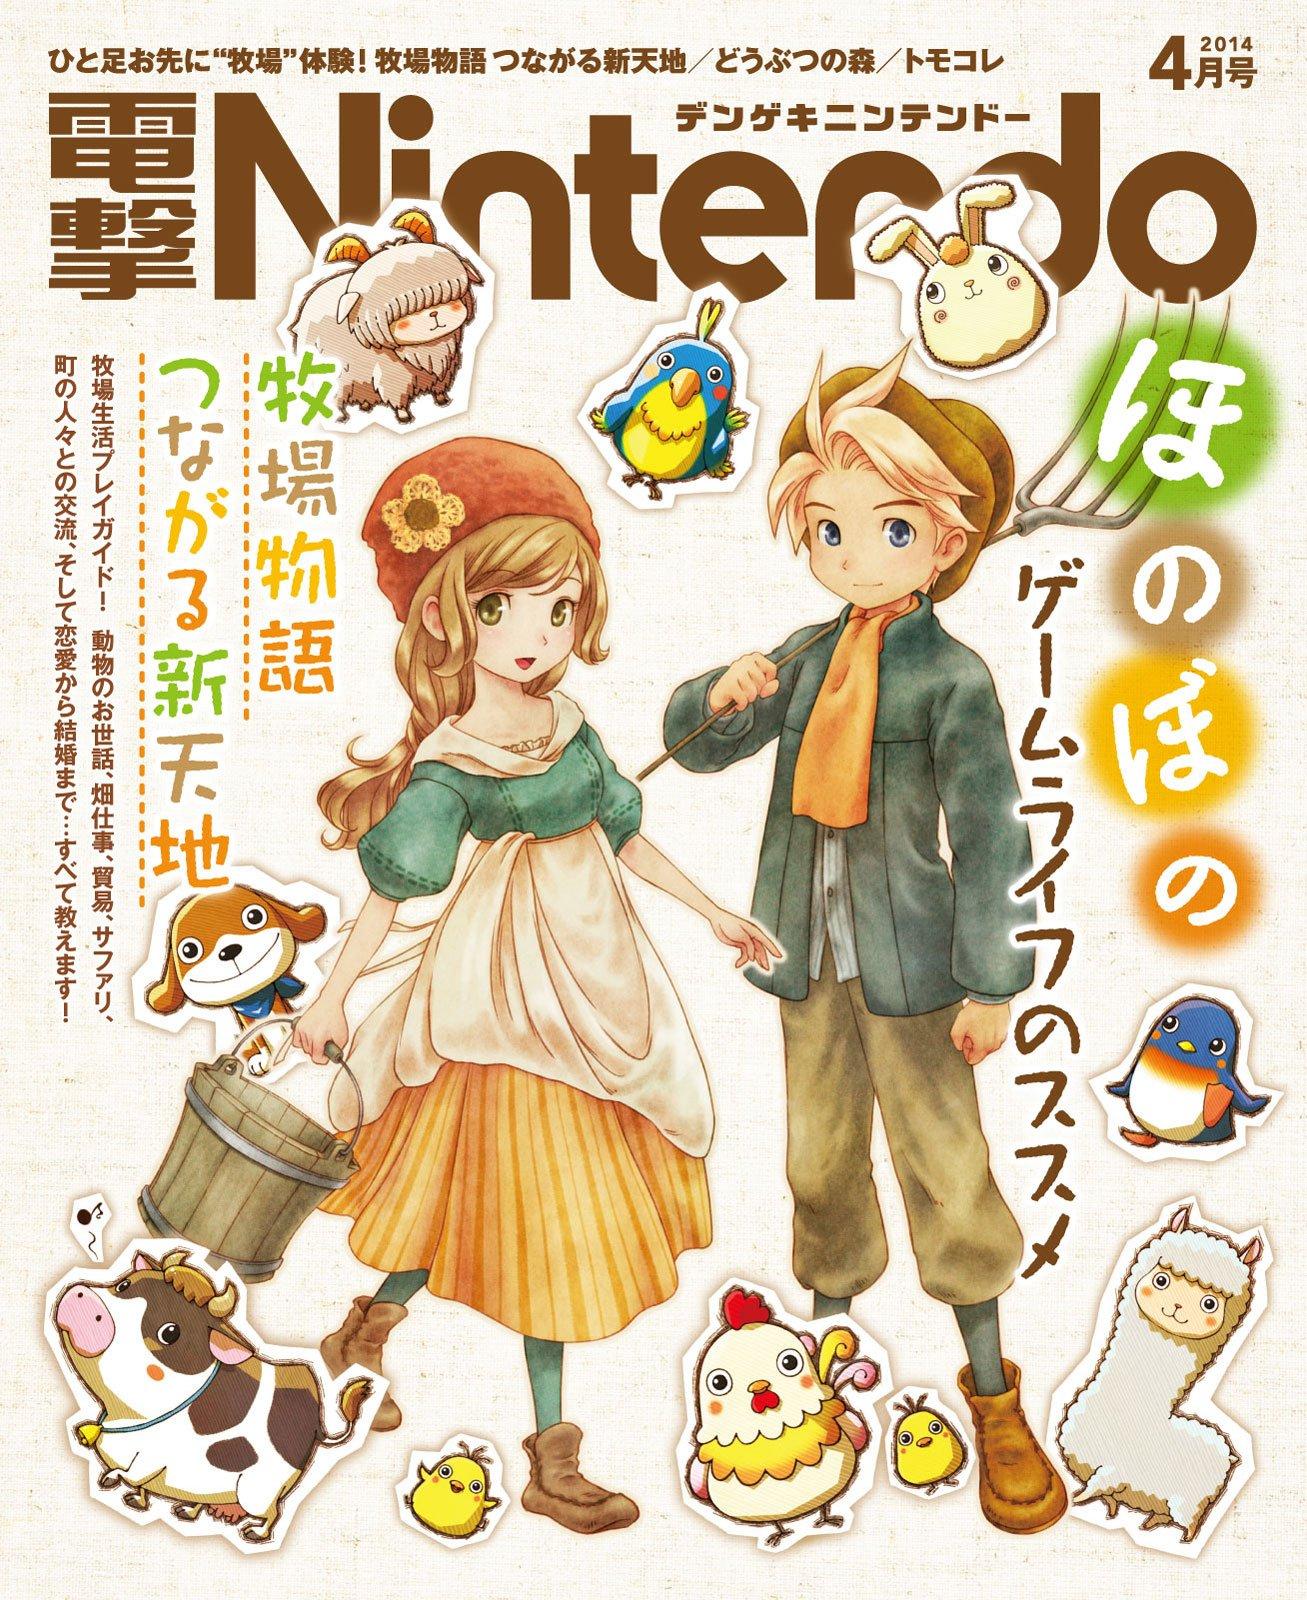 Dengeki Nintendo Issue 011 (April 2014)